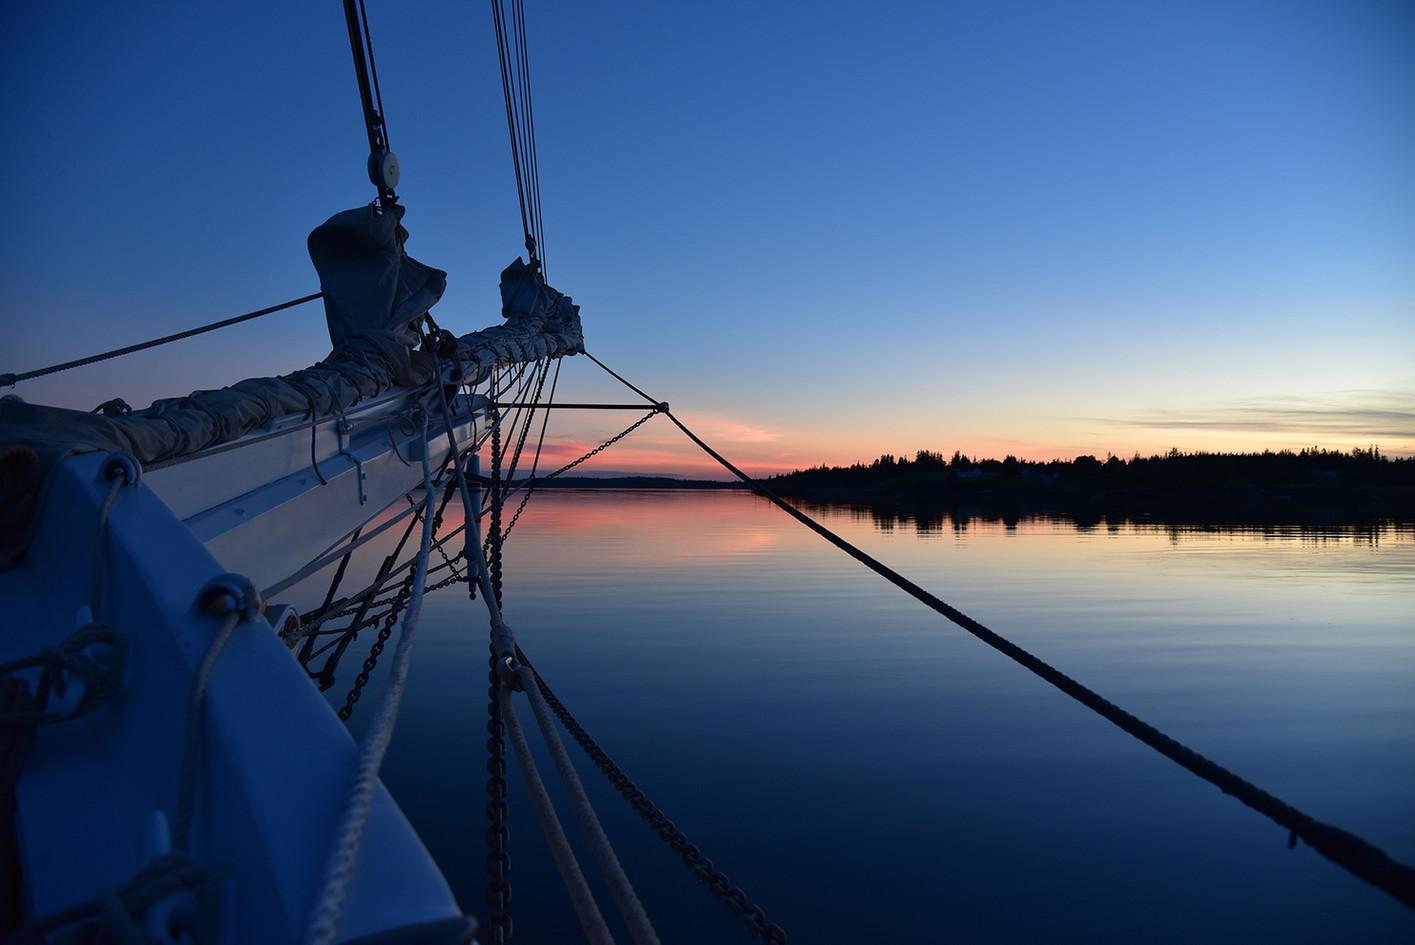 Sunrise over the bowsprit. Photo: Adam Huff